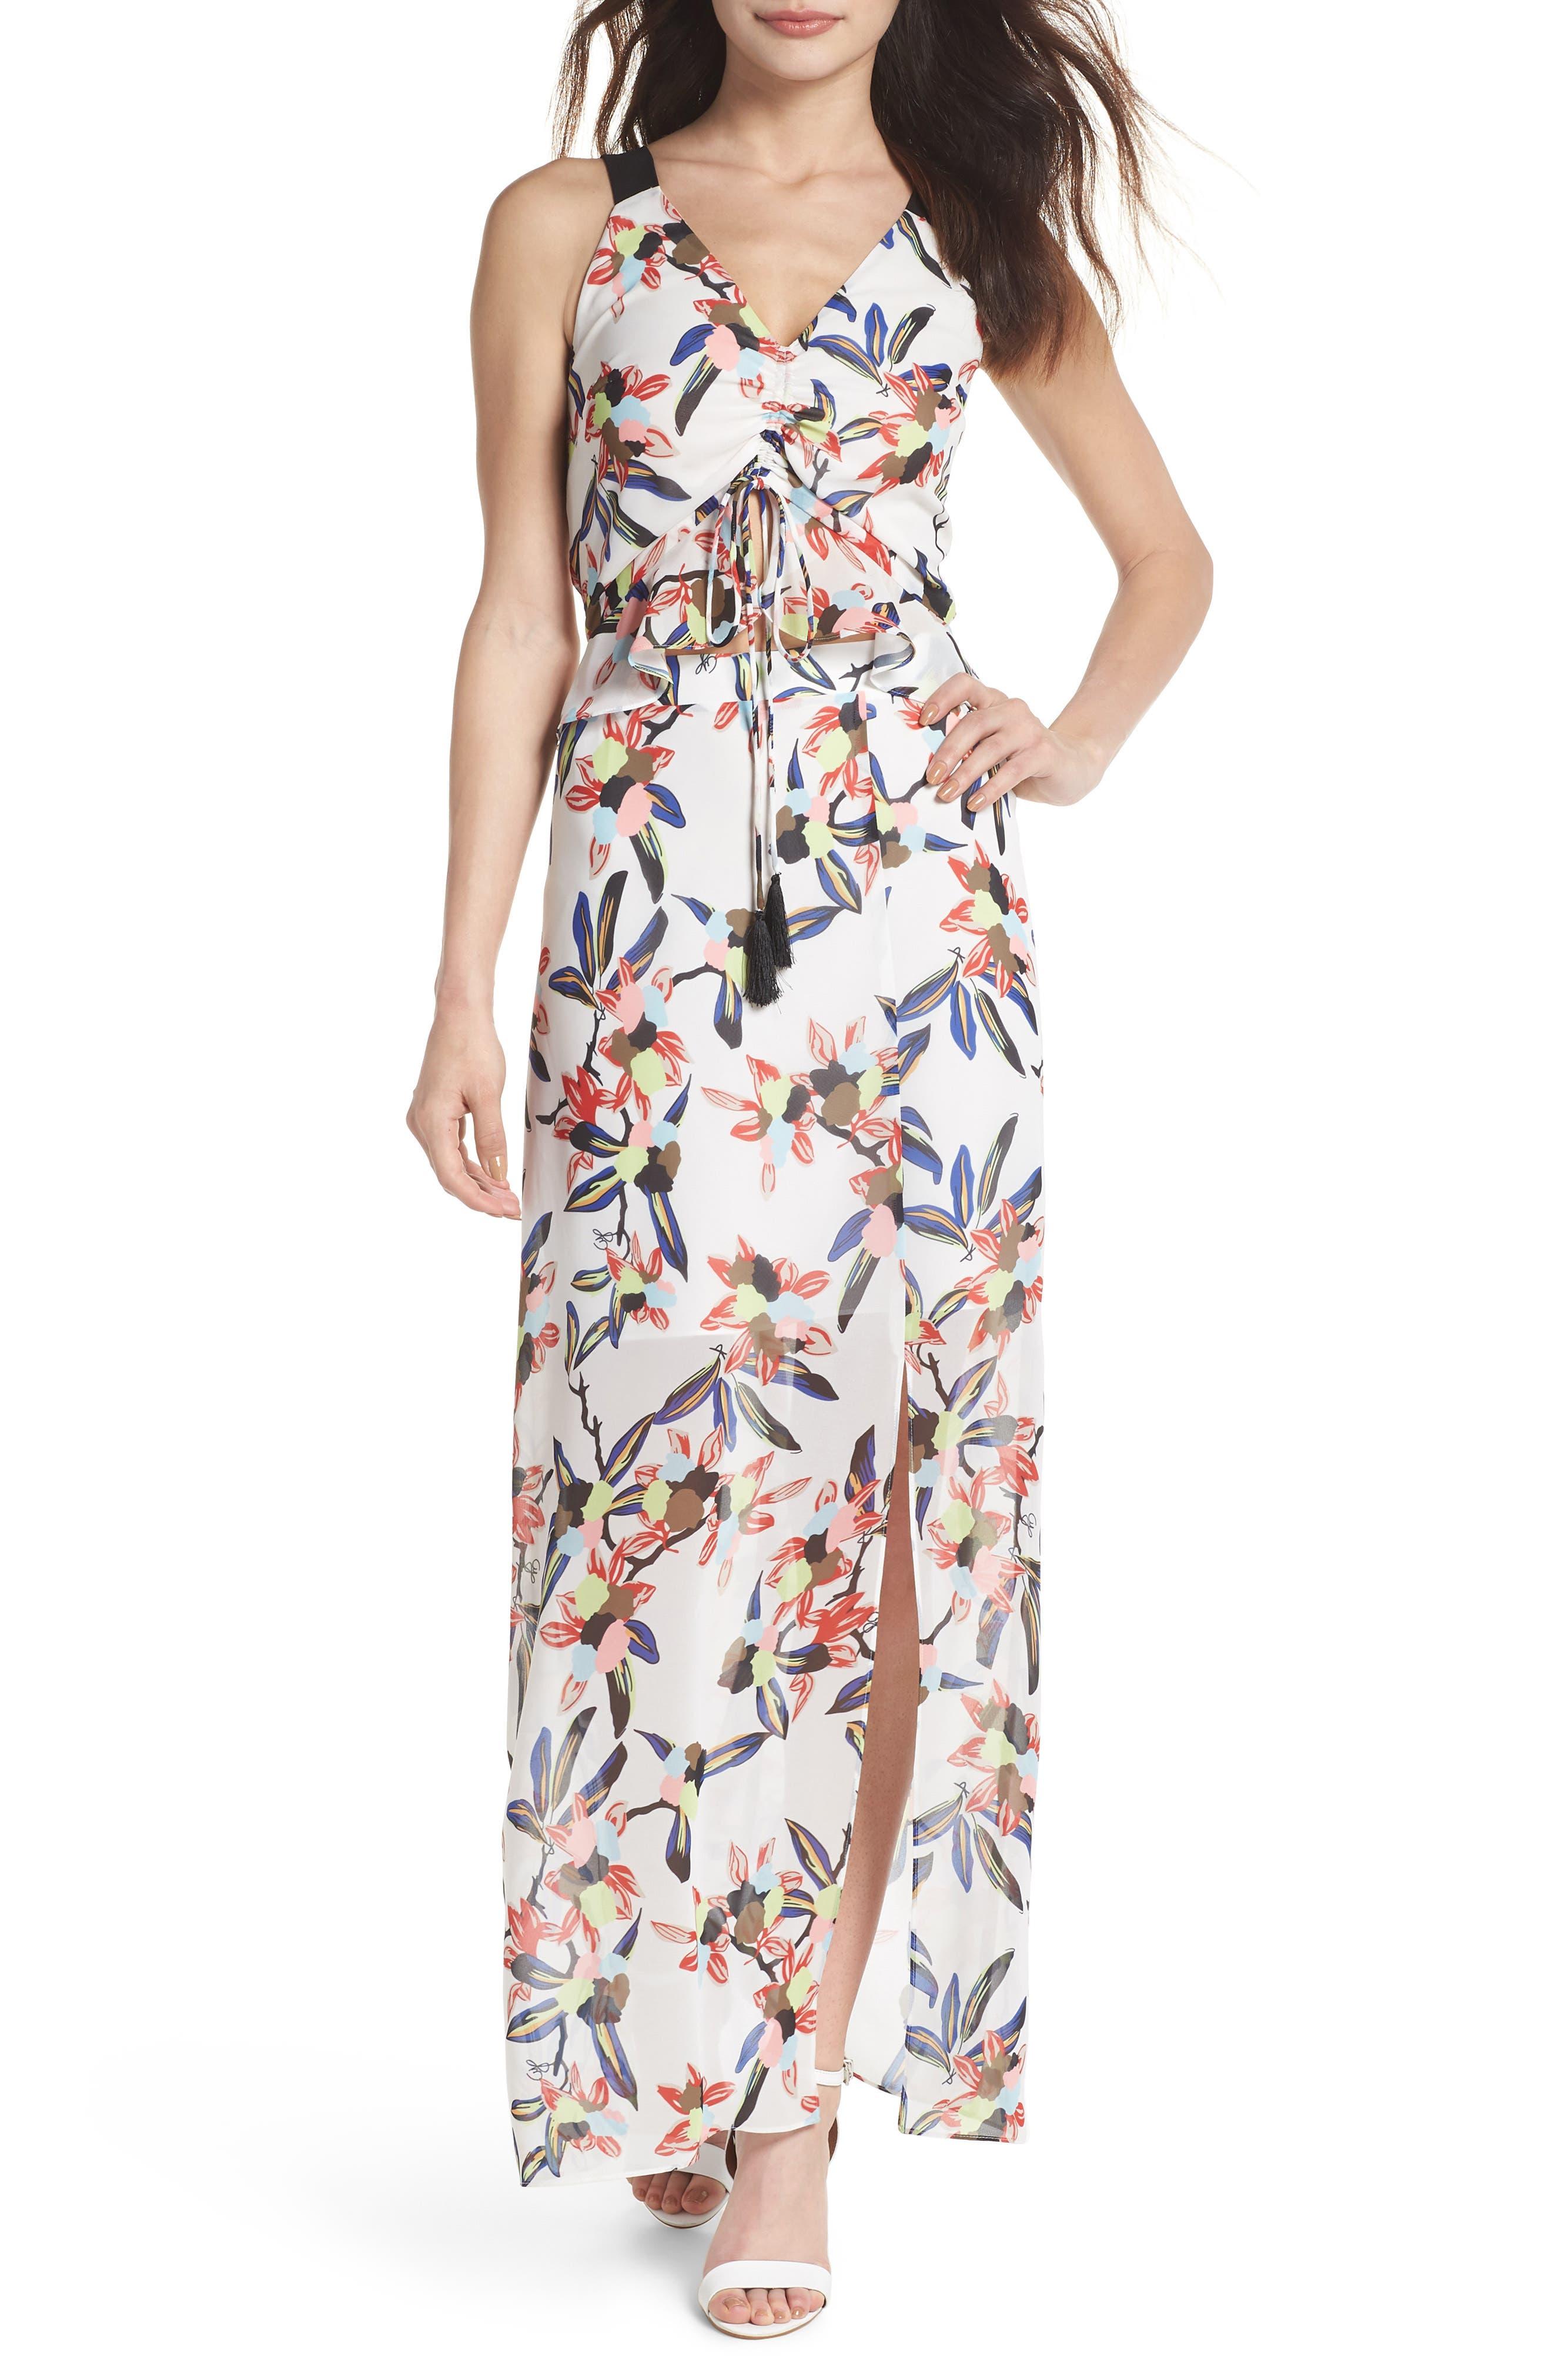 Floral Print Maxi Dress,                             Main thumbnail 1, color,                             165